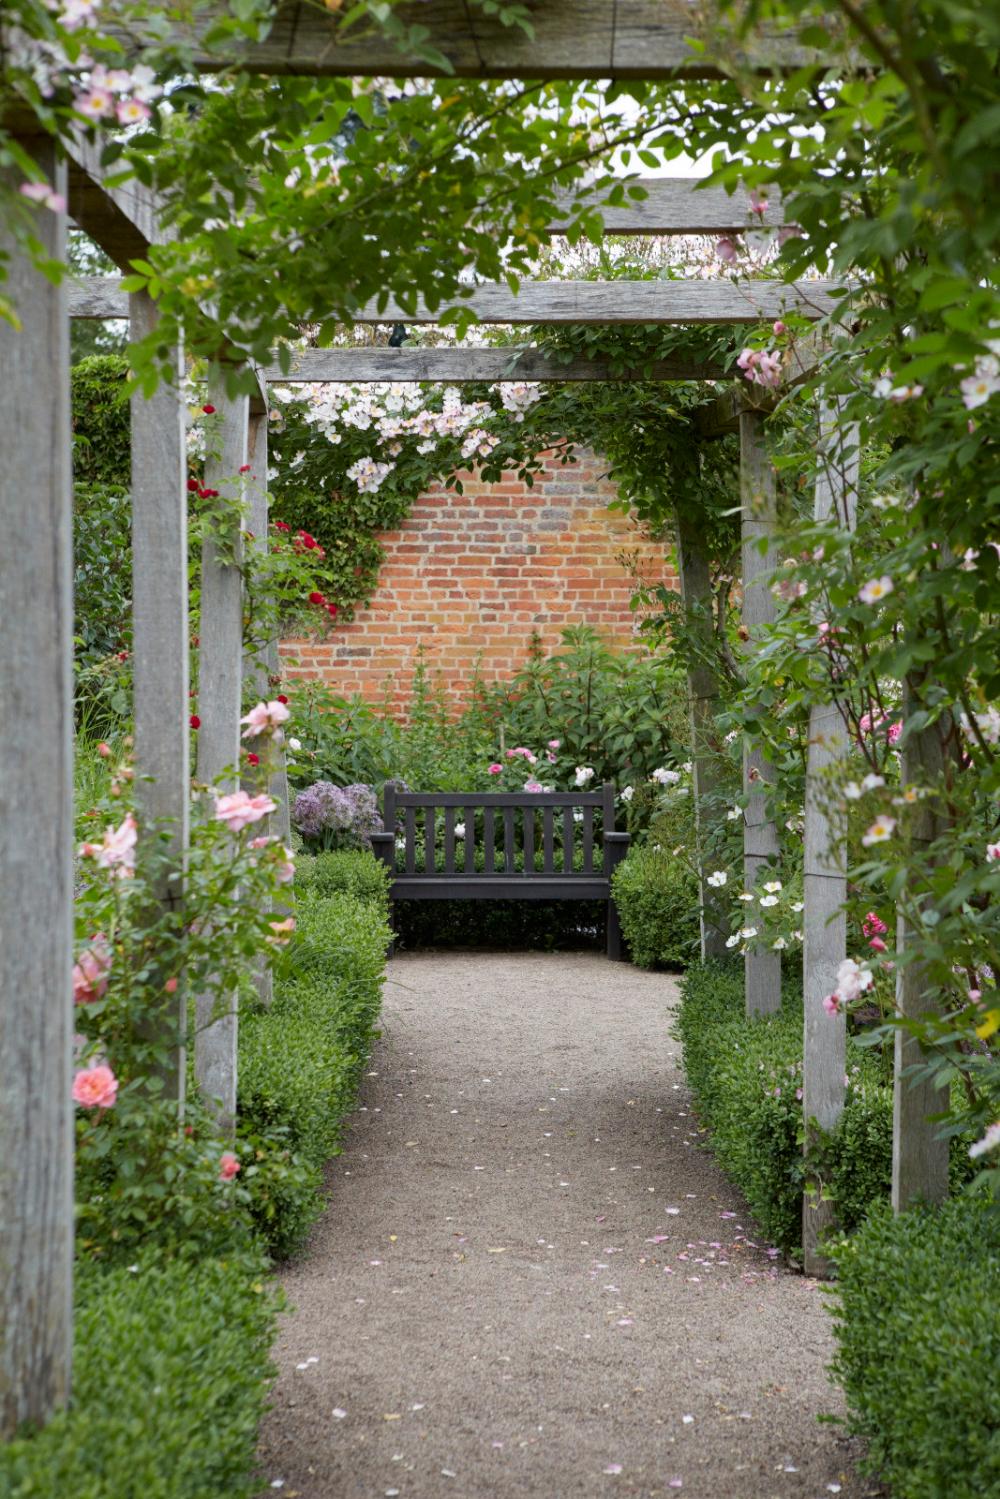 Ideas to Steal 10 Ways English Gardens Borrow from France – Rustic pergola